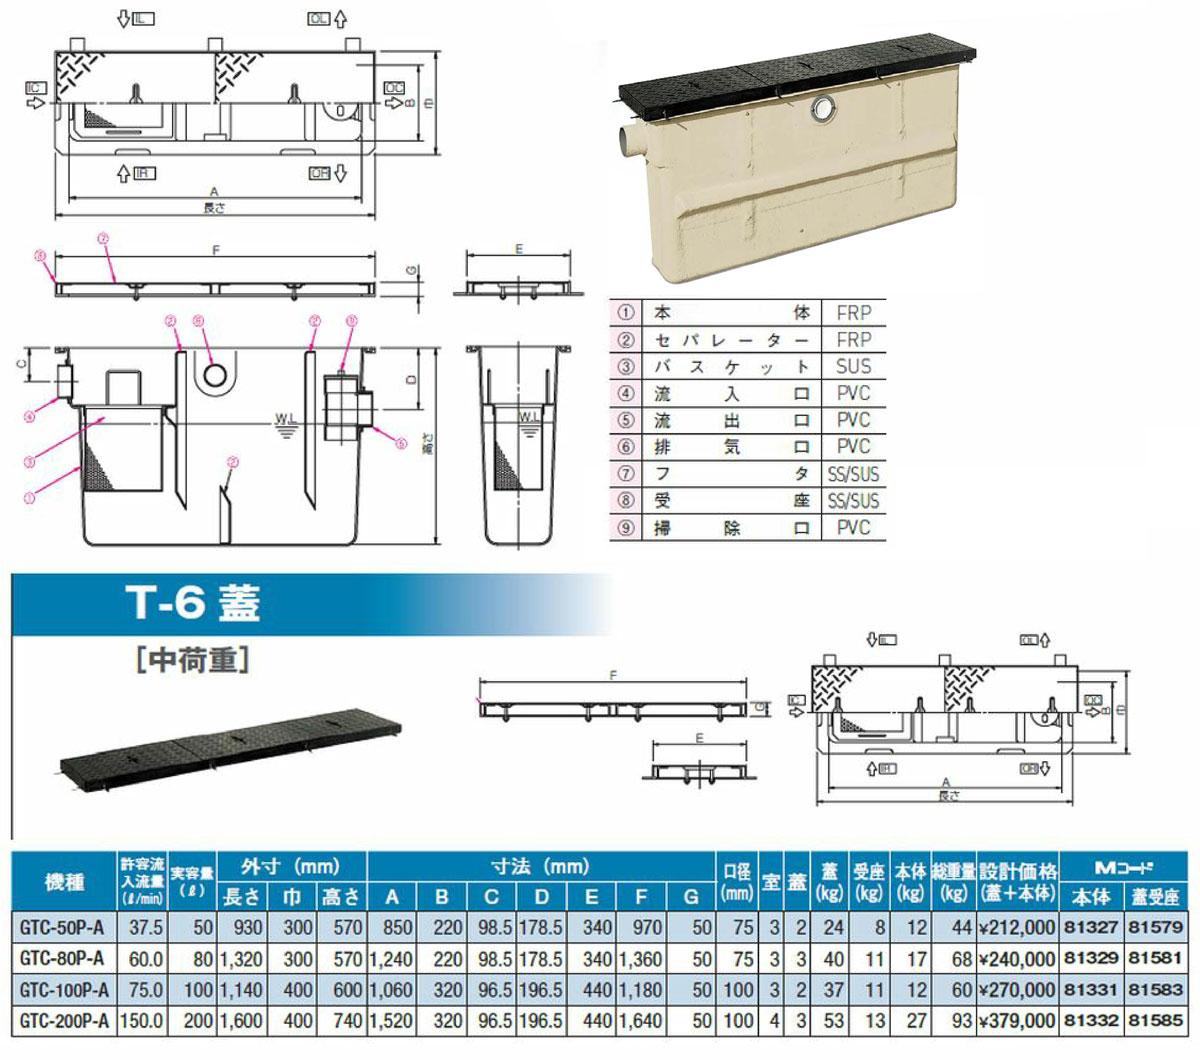 【GTC-80P-A T-6 鉄蓋】 《TKF》 マエザワ グリーストラップ パイプ流入埋設スリム型 GTC ωε1